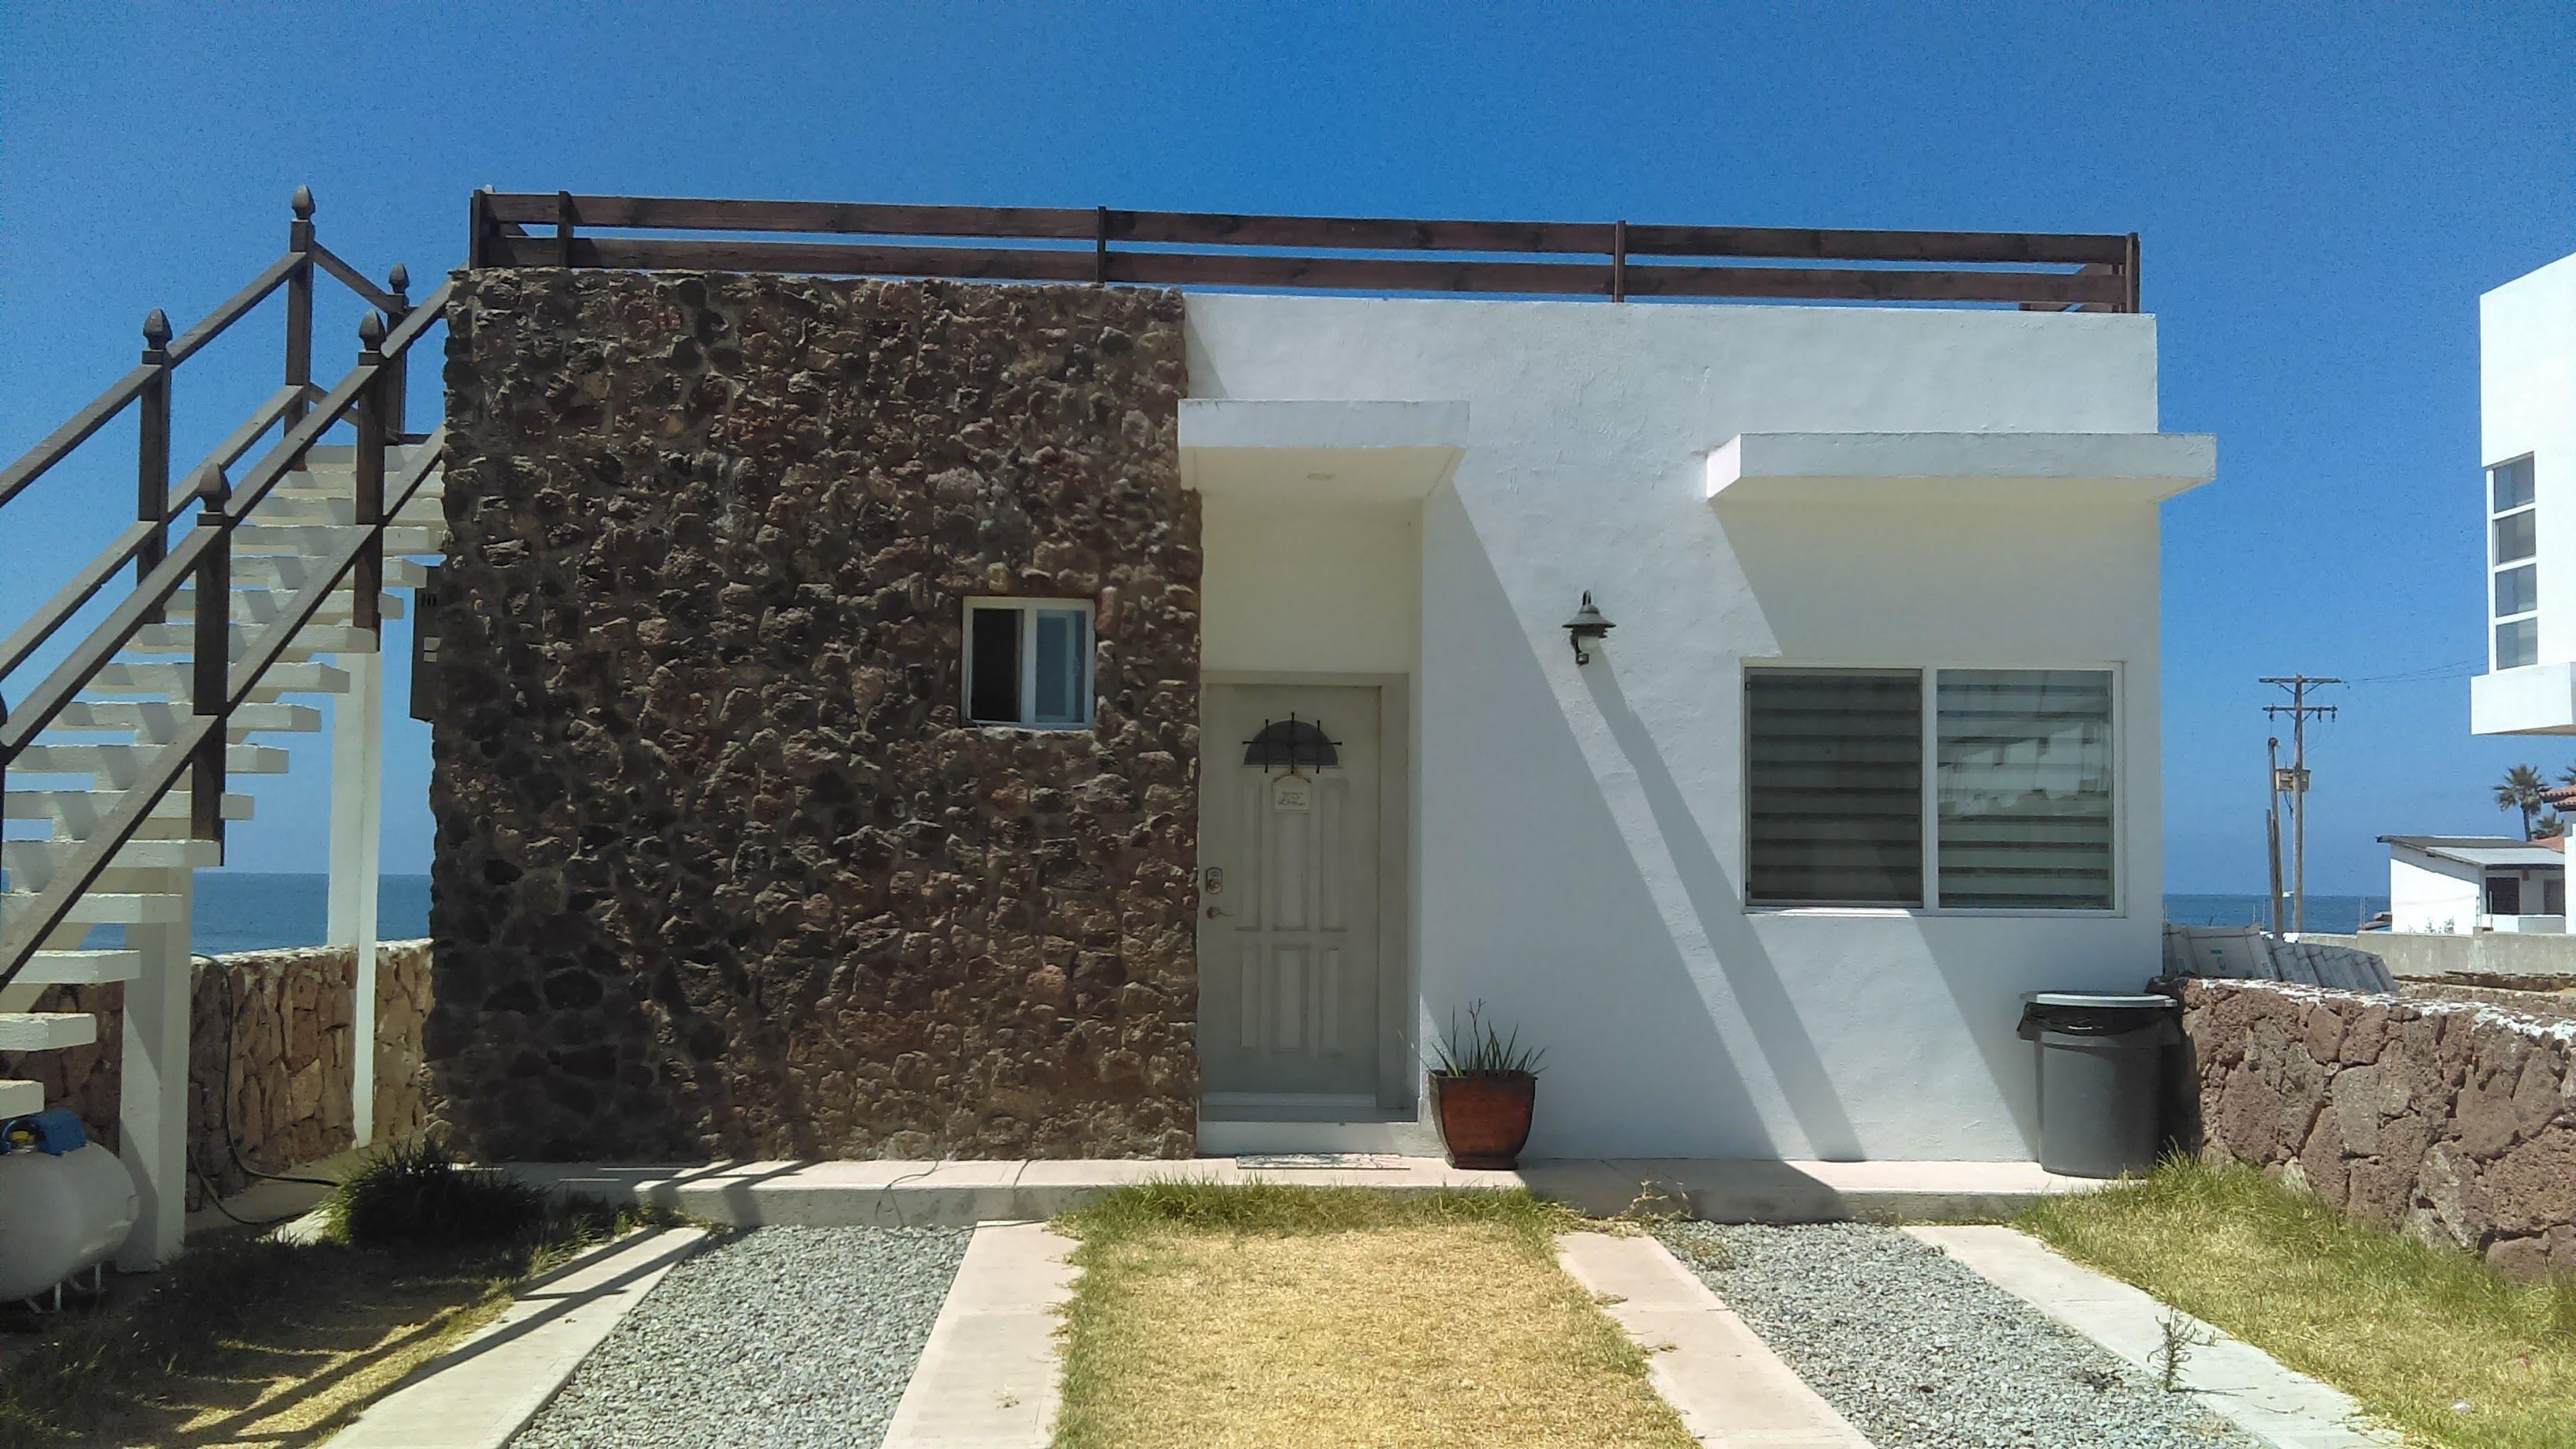 Vacation Home in Rosarito, Mexico - Booking.com |Rental Houses Rosarito Mexico